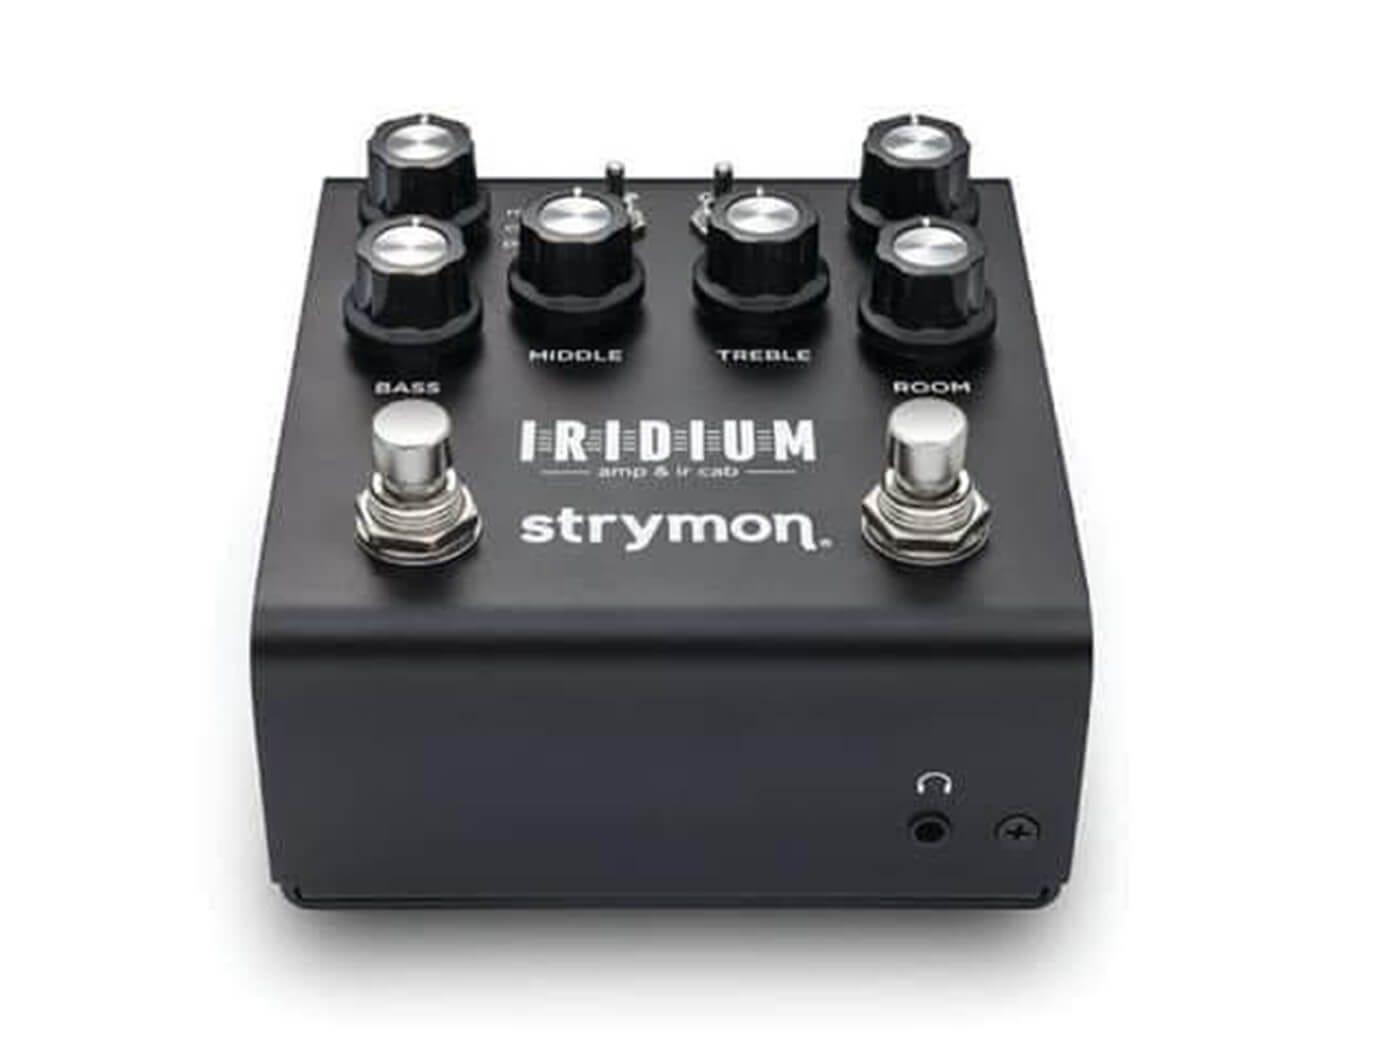 Strymon Iridium Amp Modeller & Cab I.R. Pedal